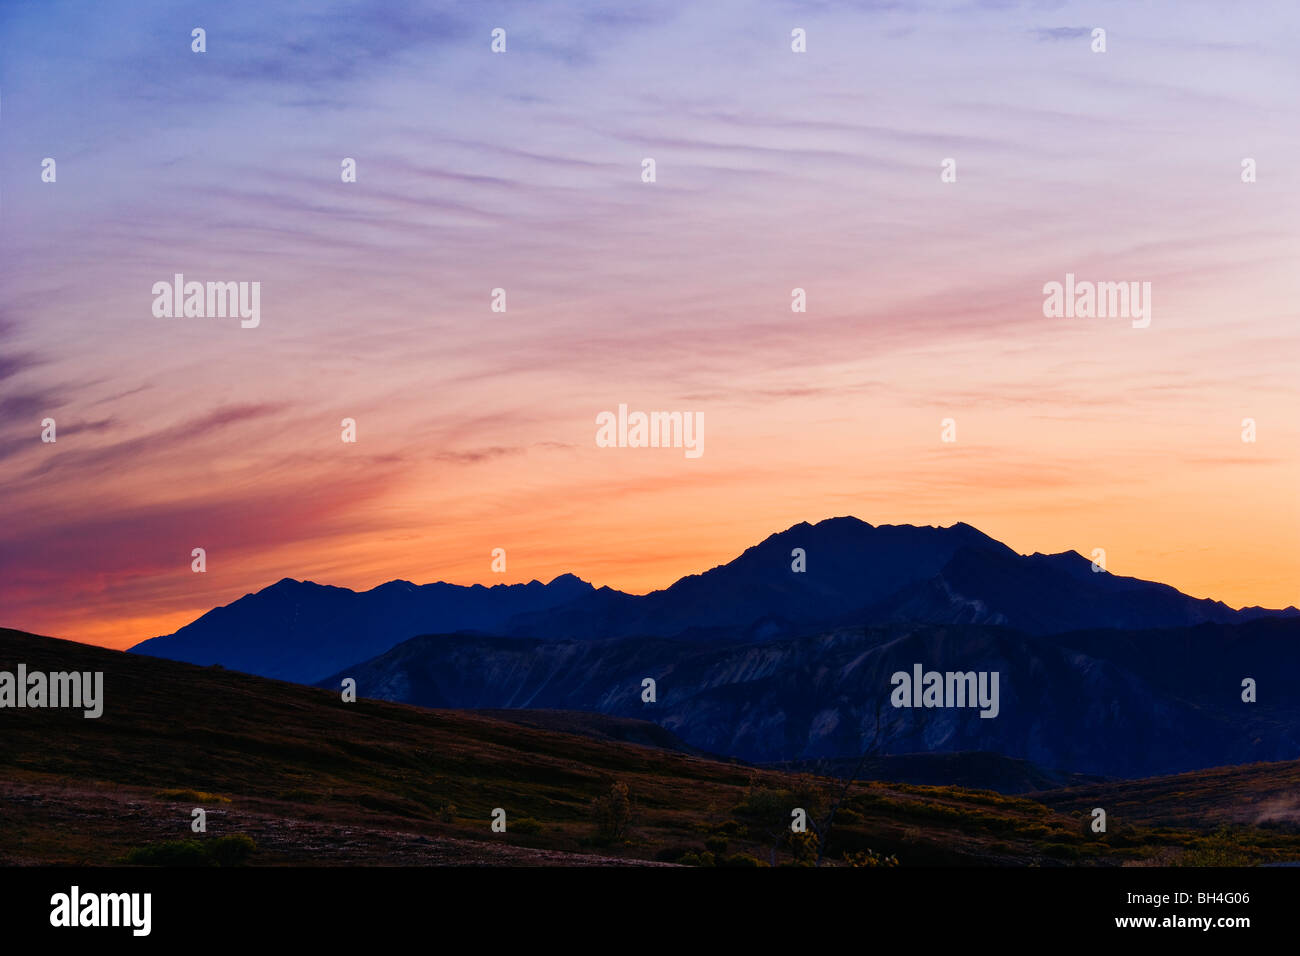 Mountains and sky at dusk from Sable Pass, Denali National Park, Alaska - Stock Image